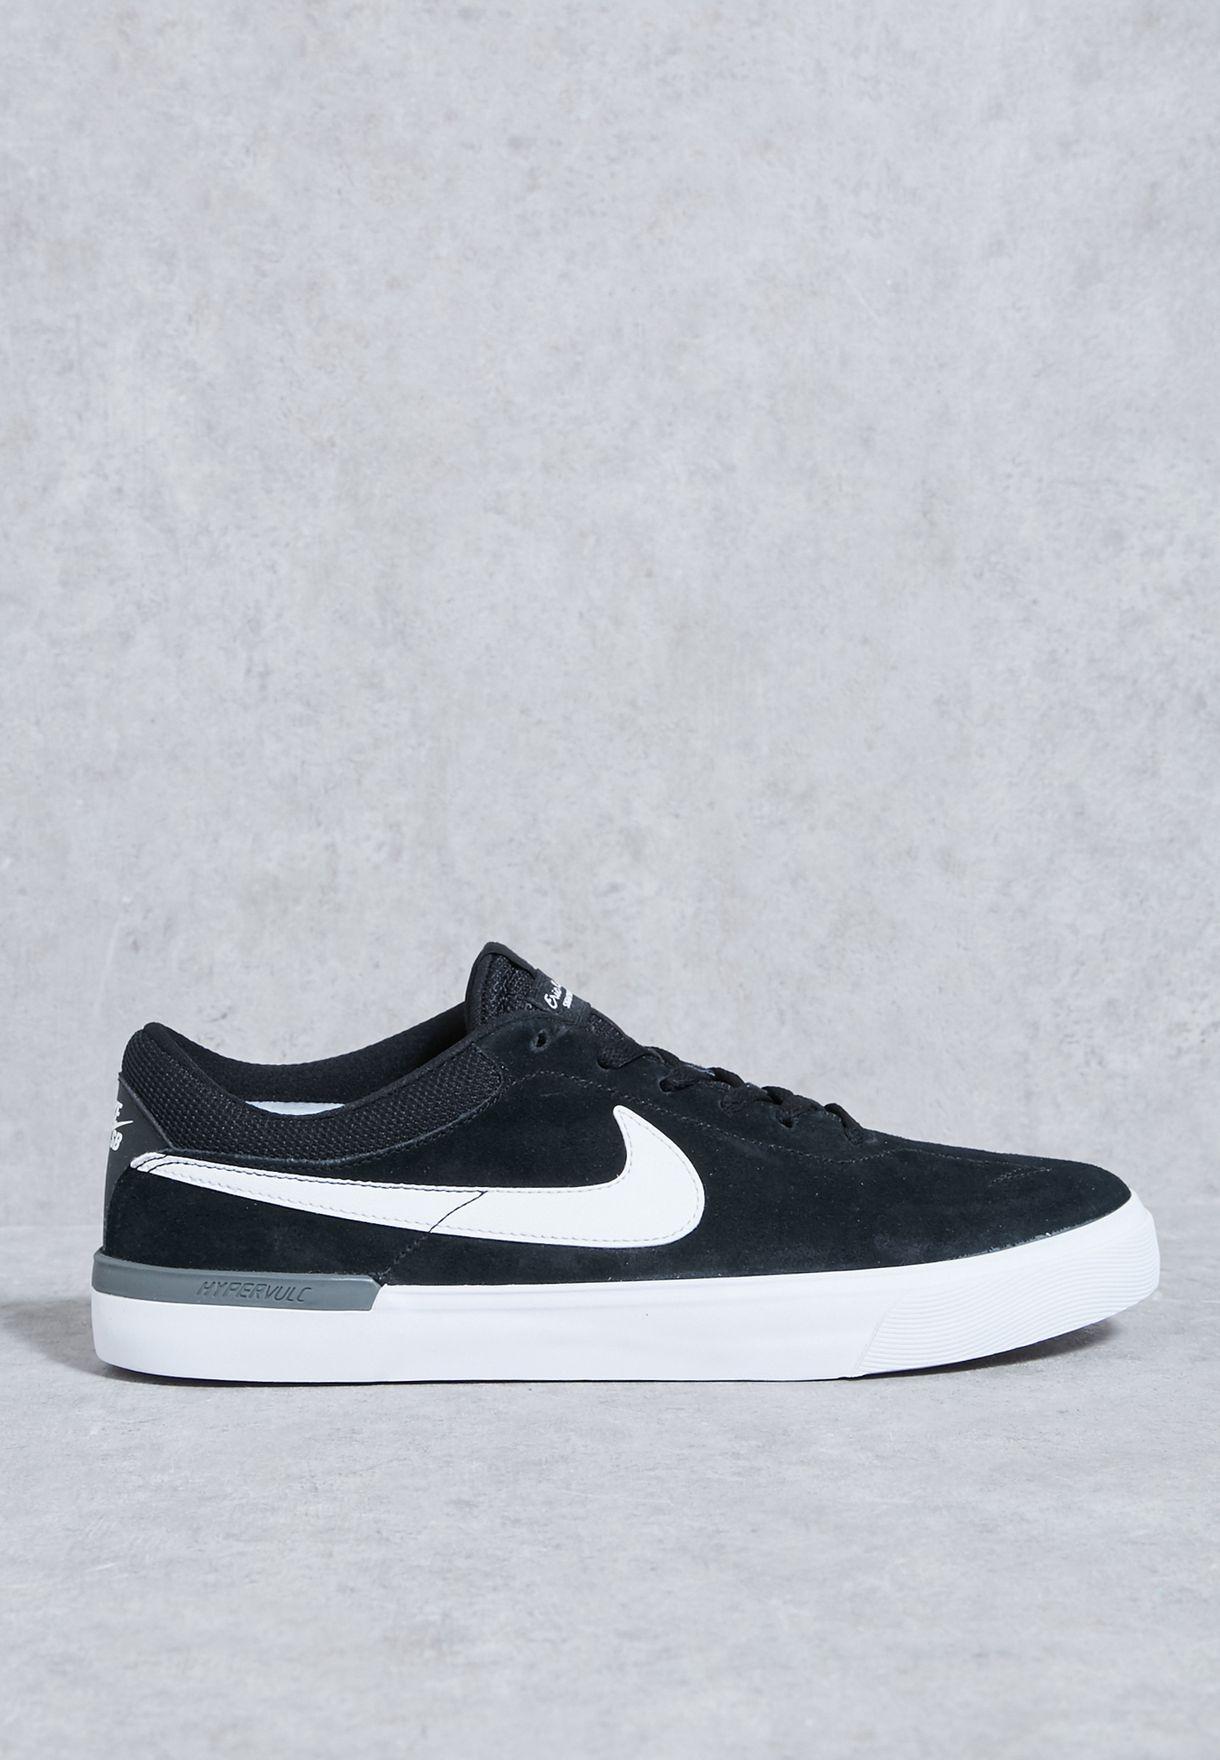 29b2b1aca59 Shop Nike black SB Koston Hypervulc 844447-001 for Men in UAE ...